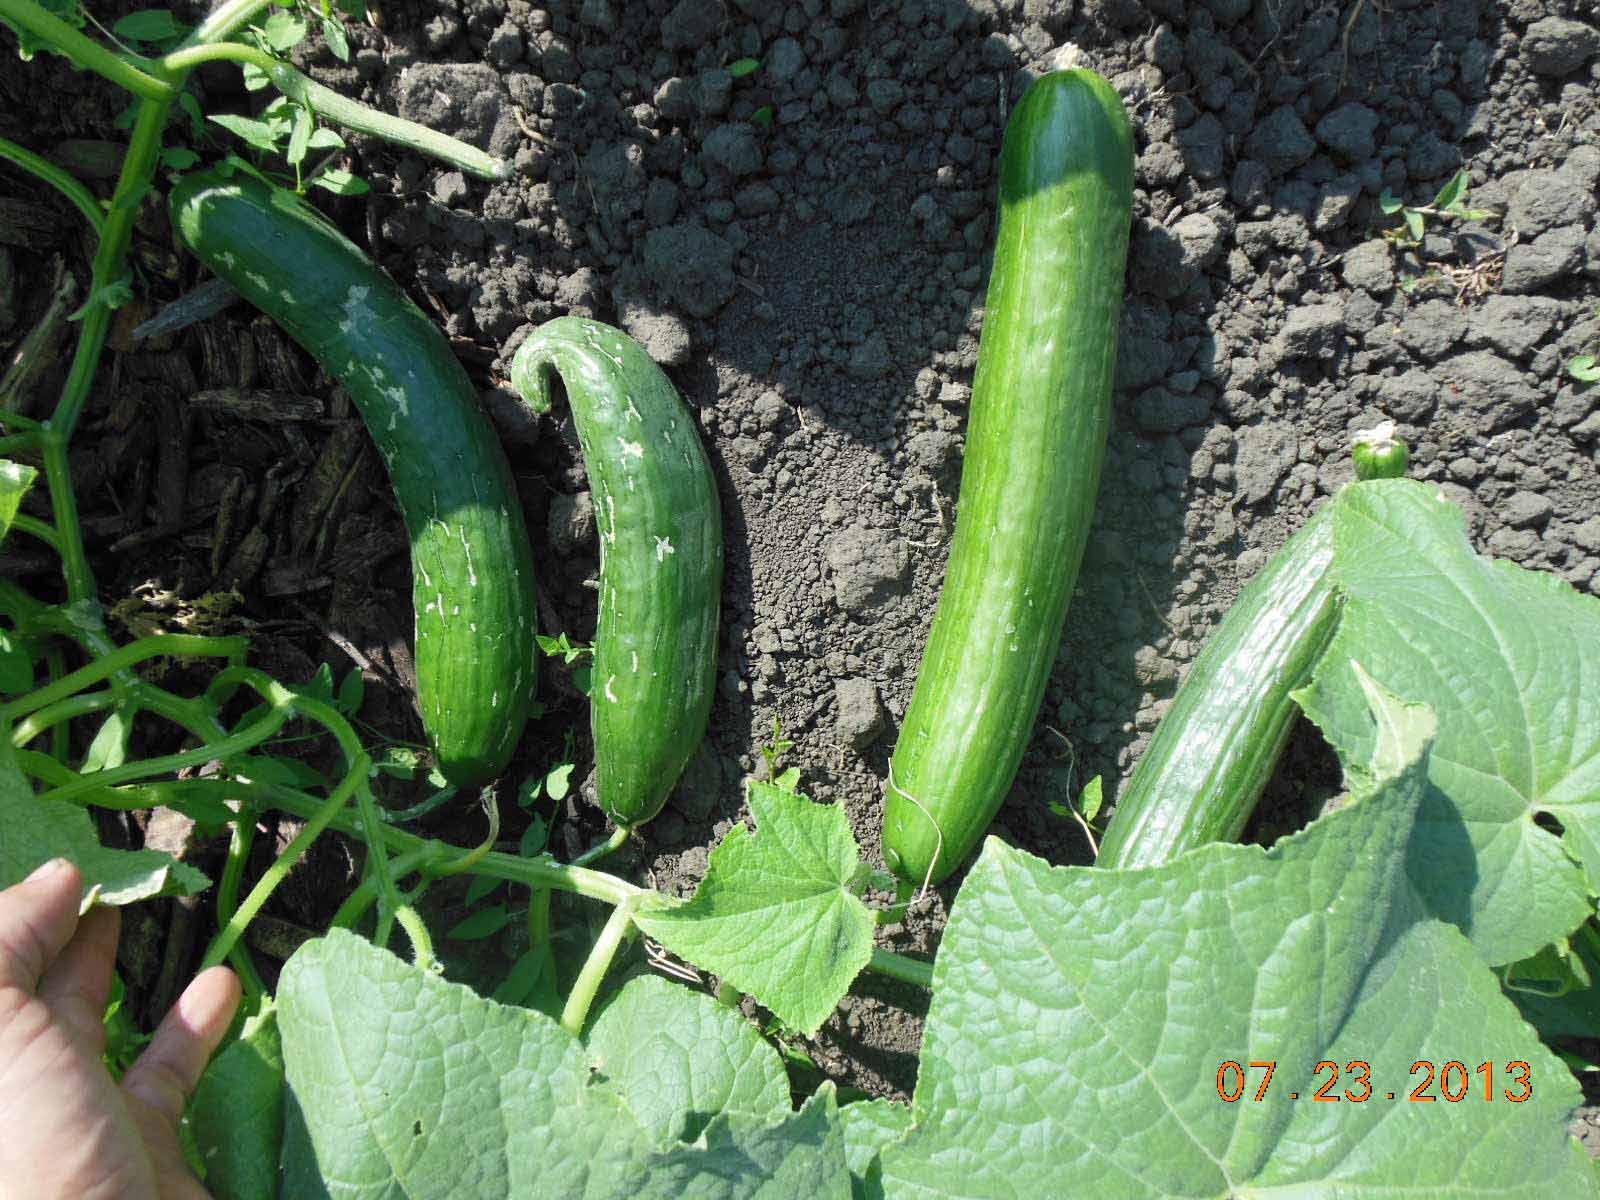 English cucumber sweet and crisp 2013 pic 2